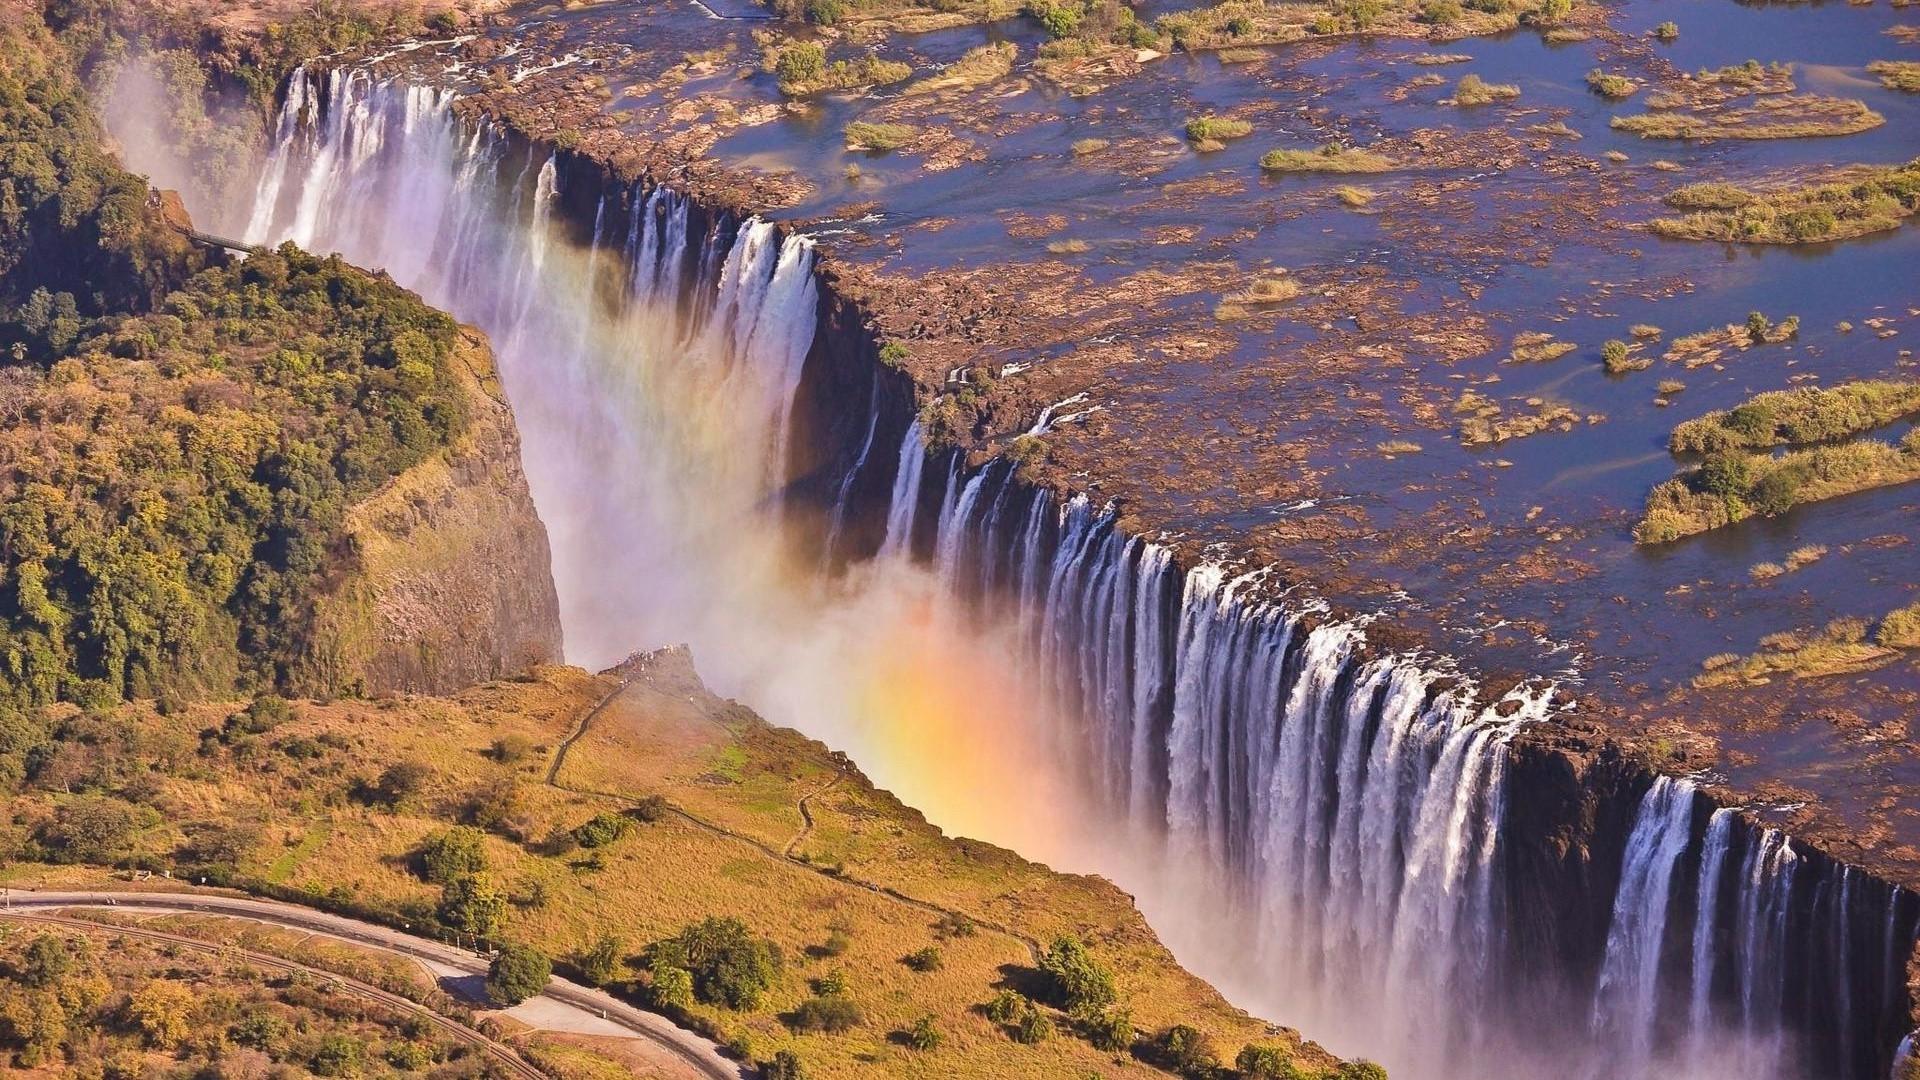 Victoria Falls Zambia wallpaper 4138 1920x1080